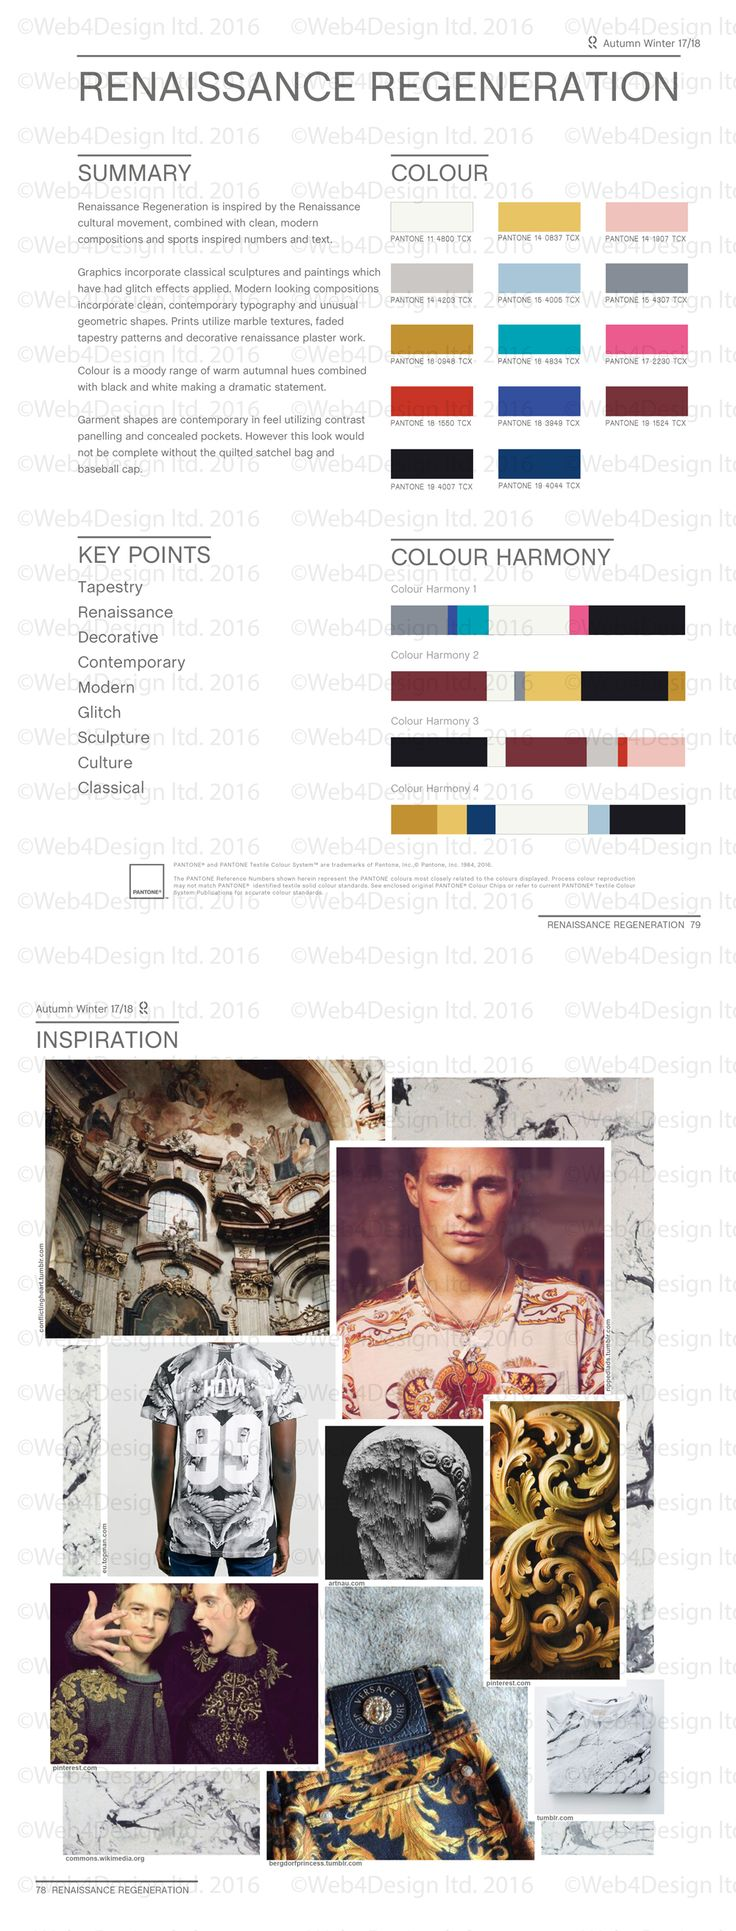 Style Right Renaissance Regeneration AW1718 Trend Board